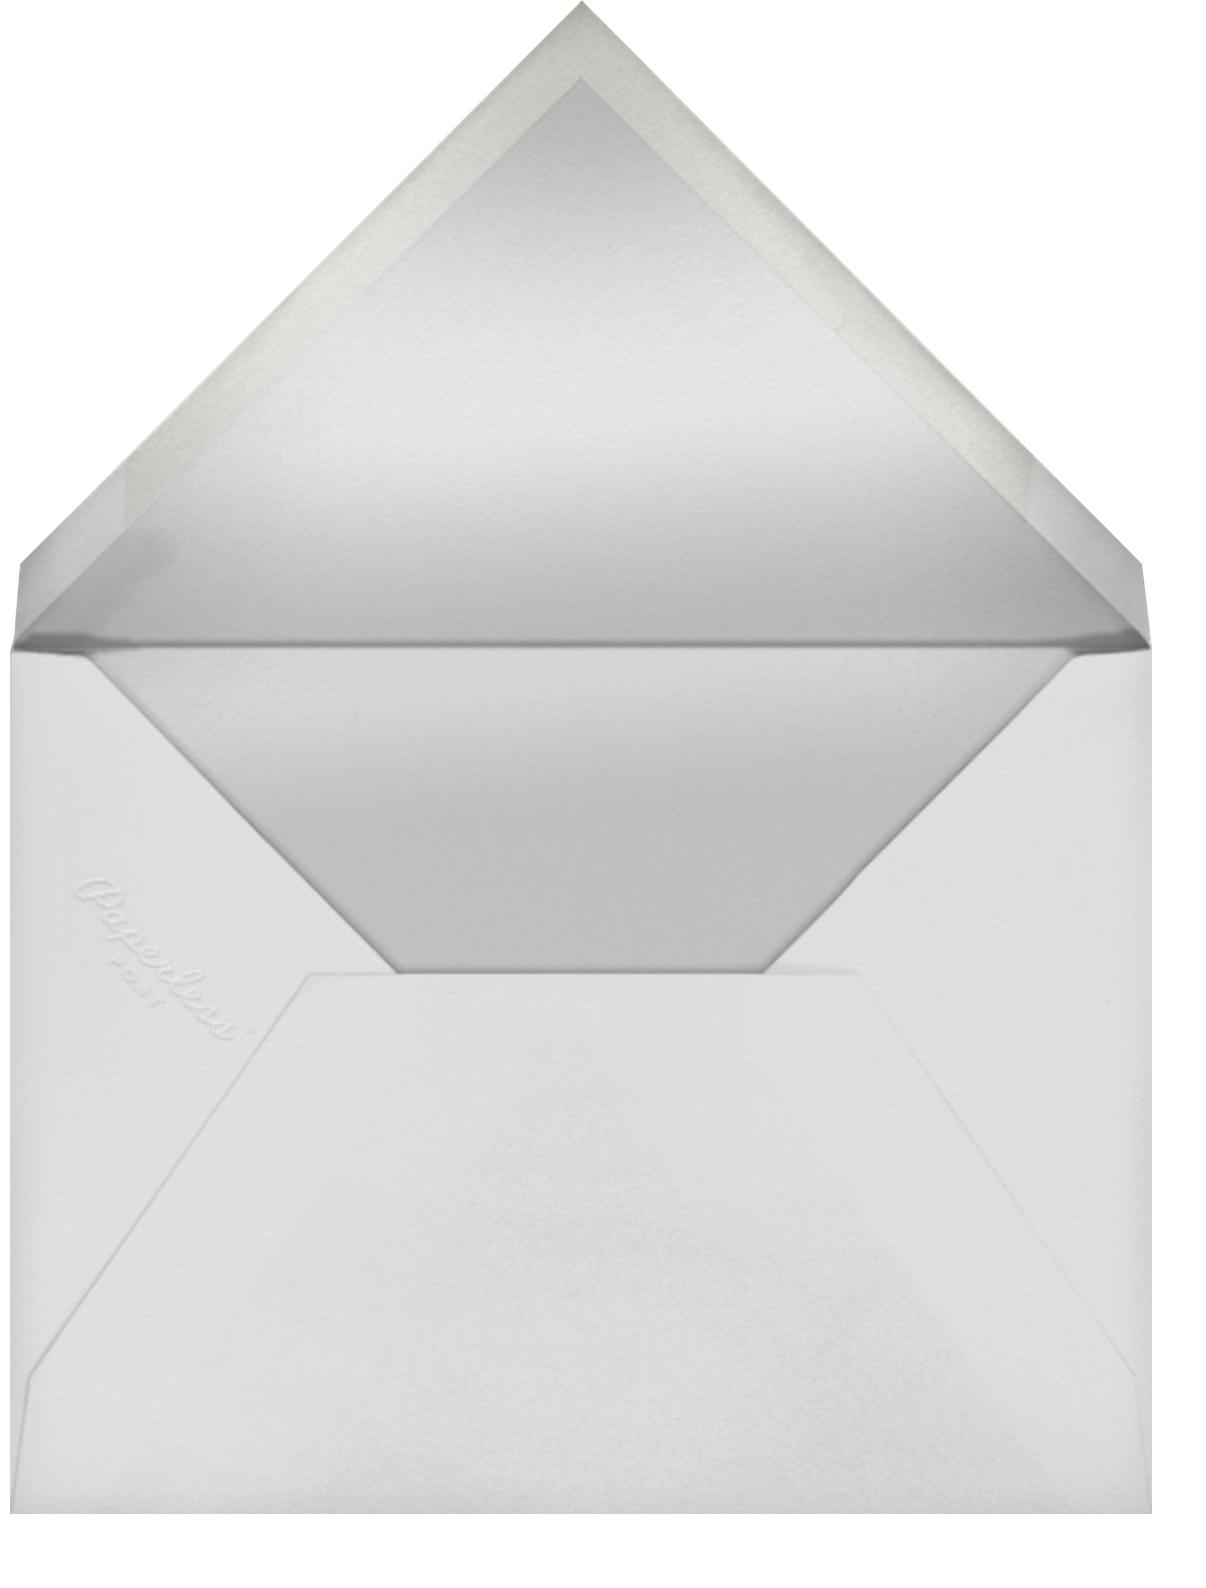 Felix and Isabelle (Menu) - Green - Liberty - Envelope